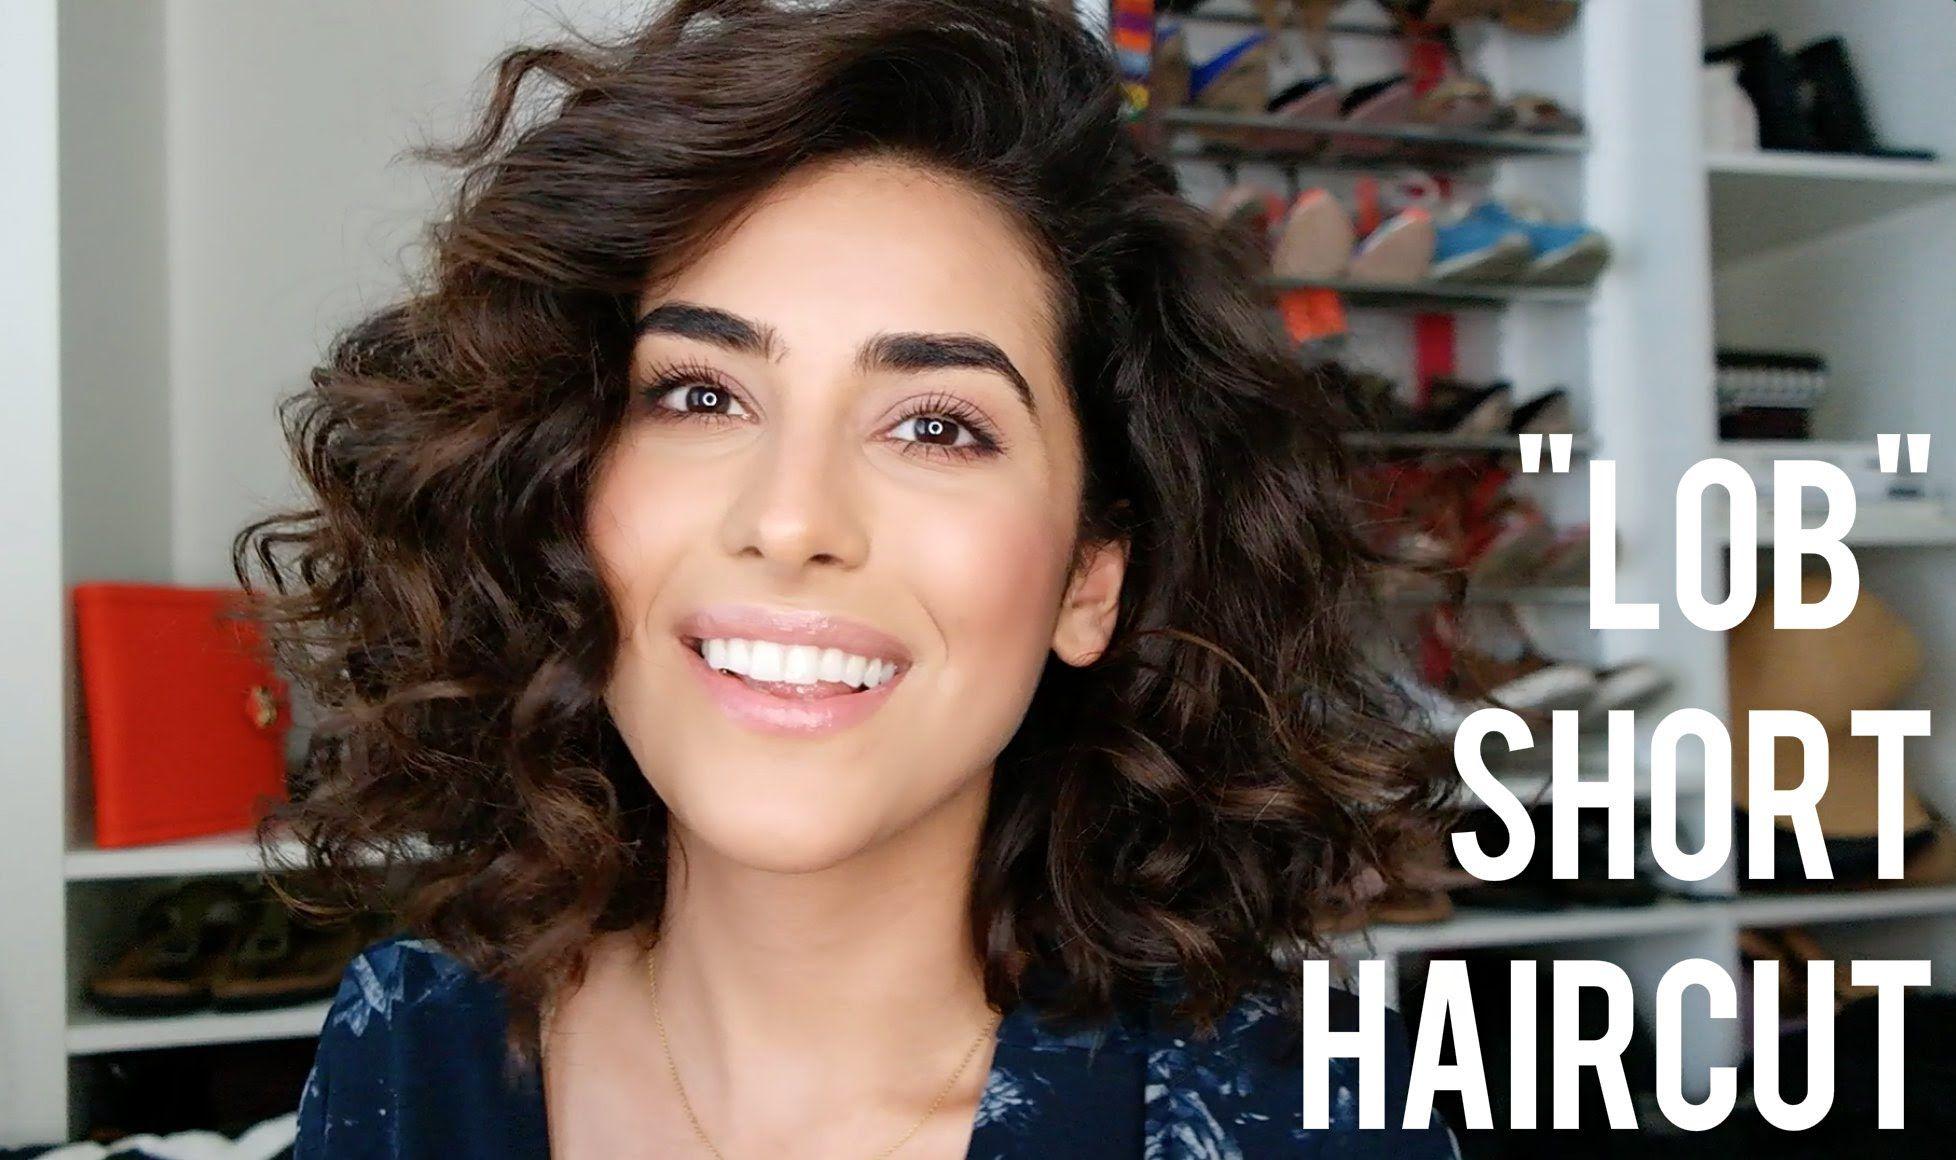 My Short Lob Haircut Tips For Styling Lob Video Tutorials